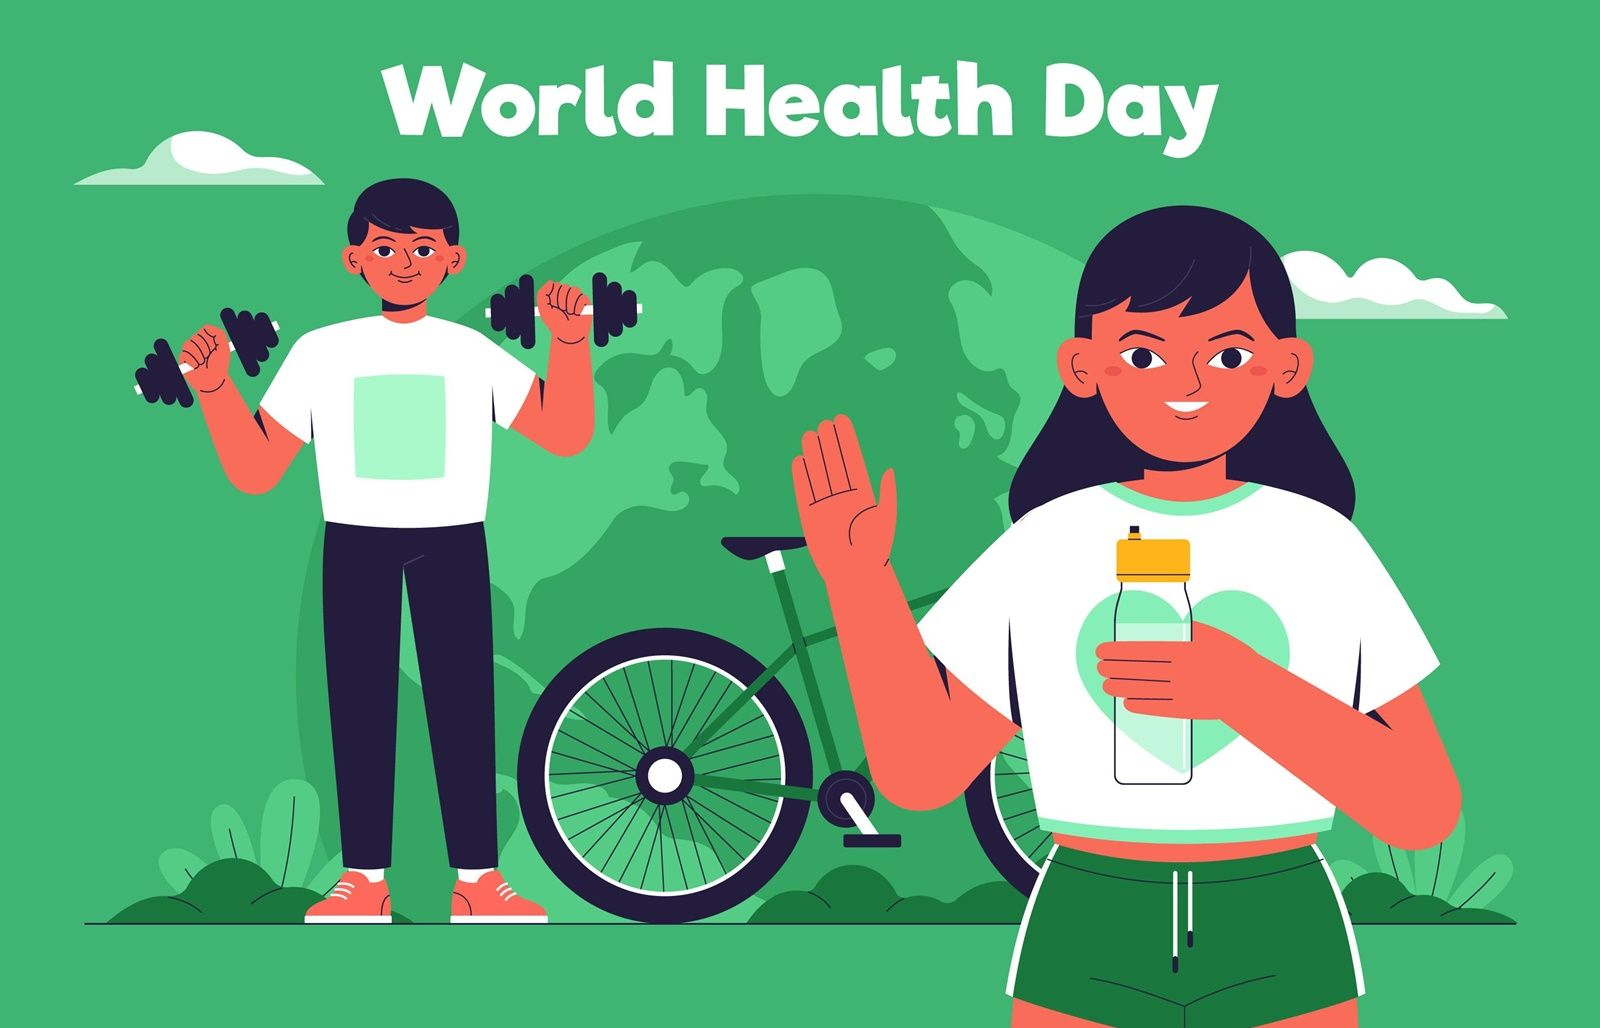 April 7 - World Health Day